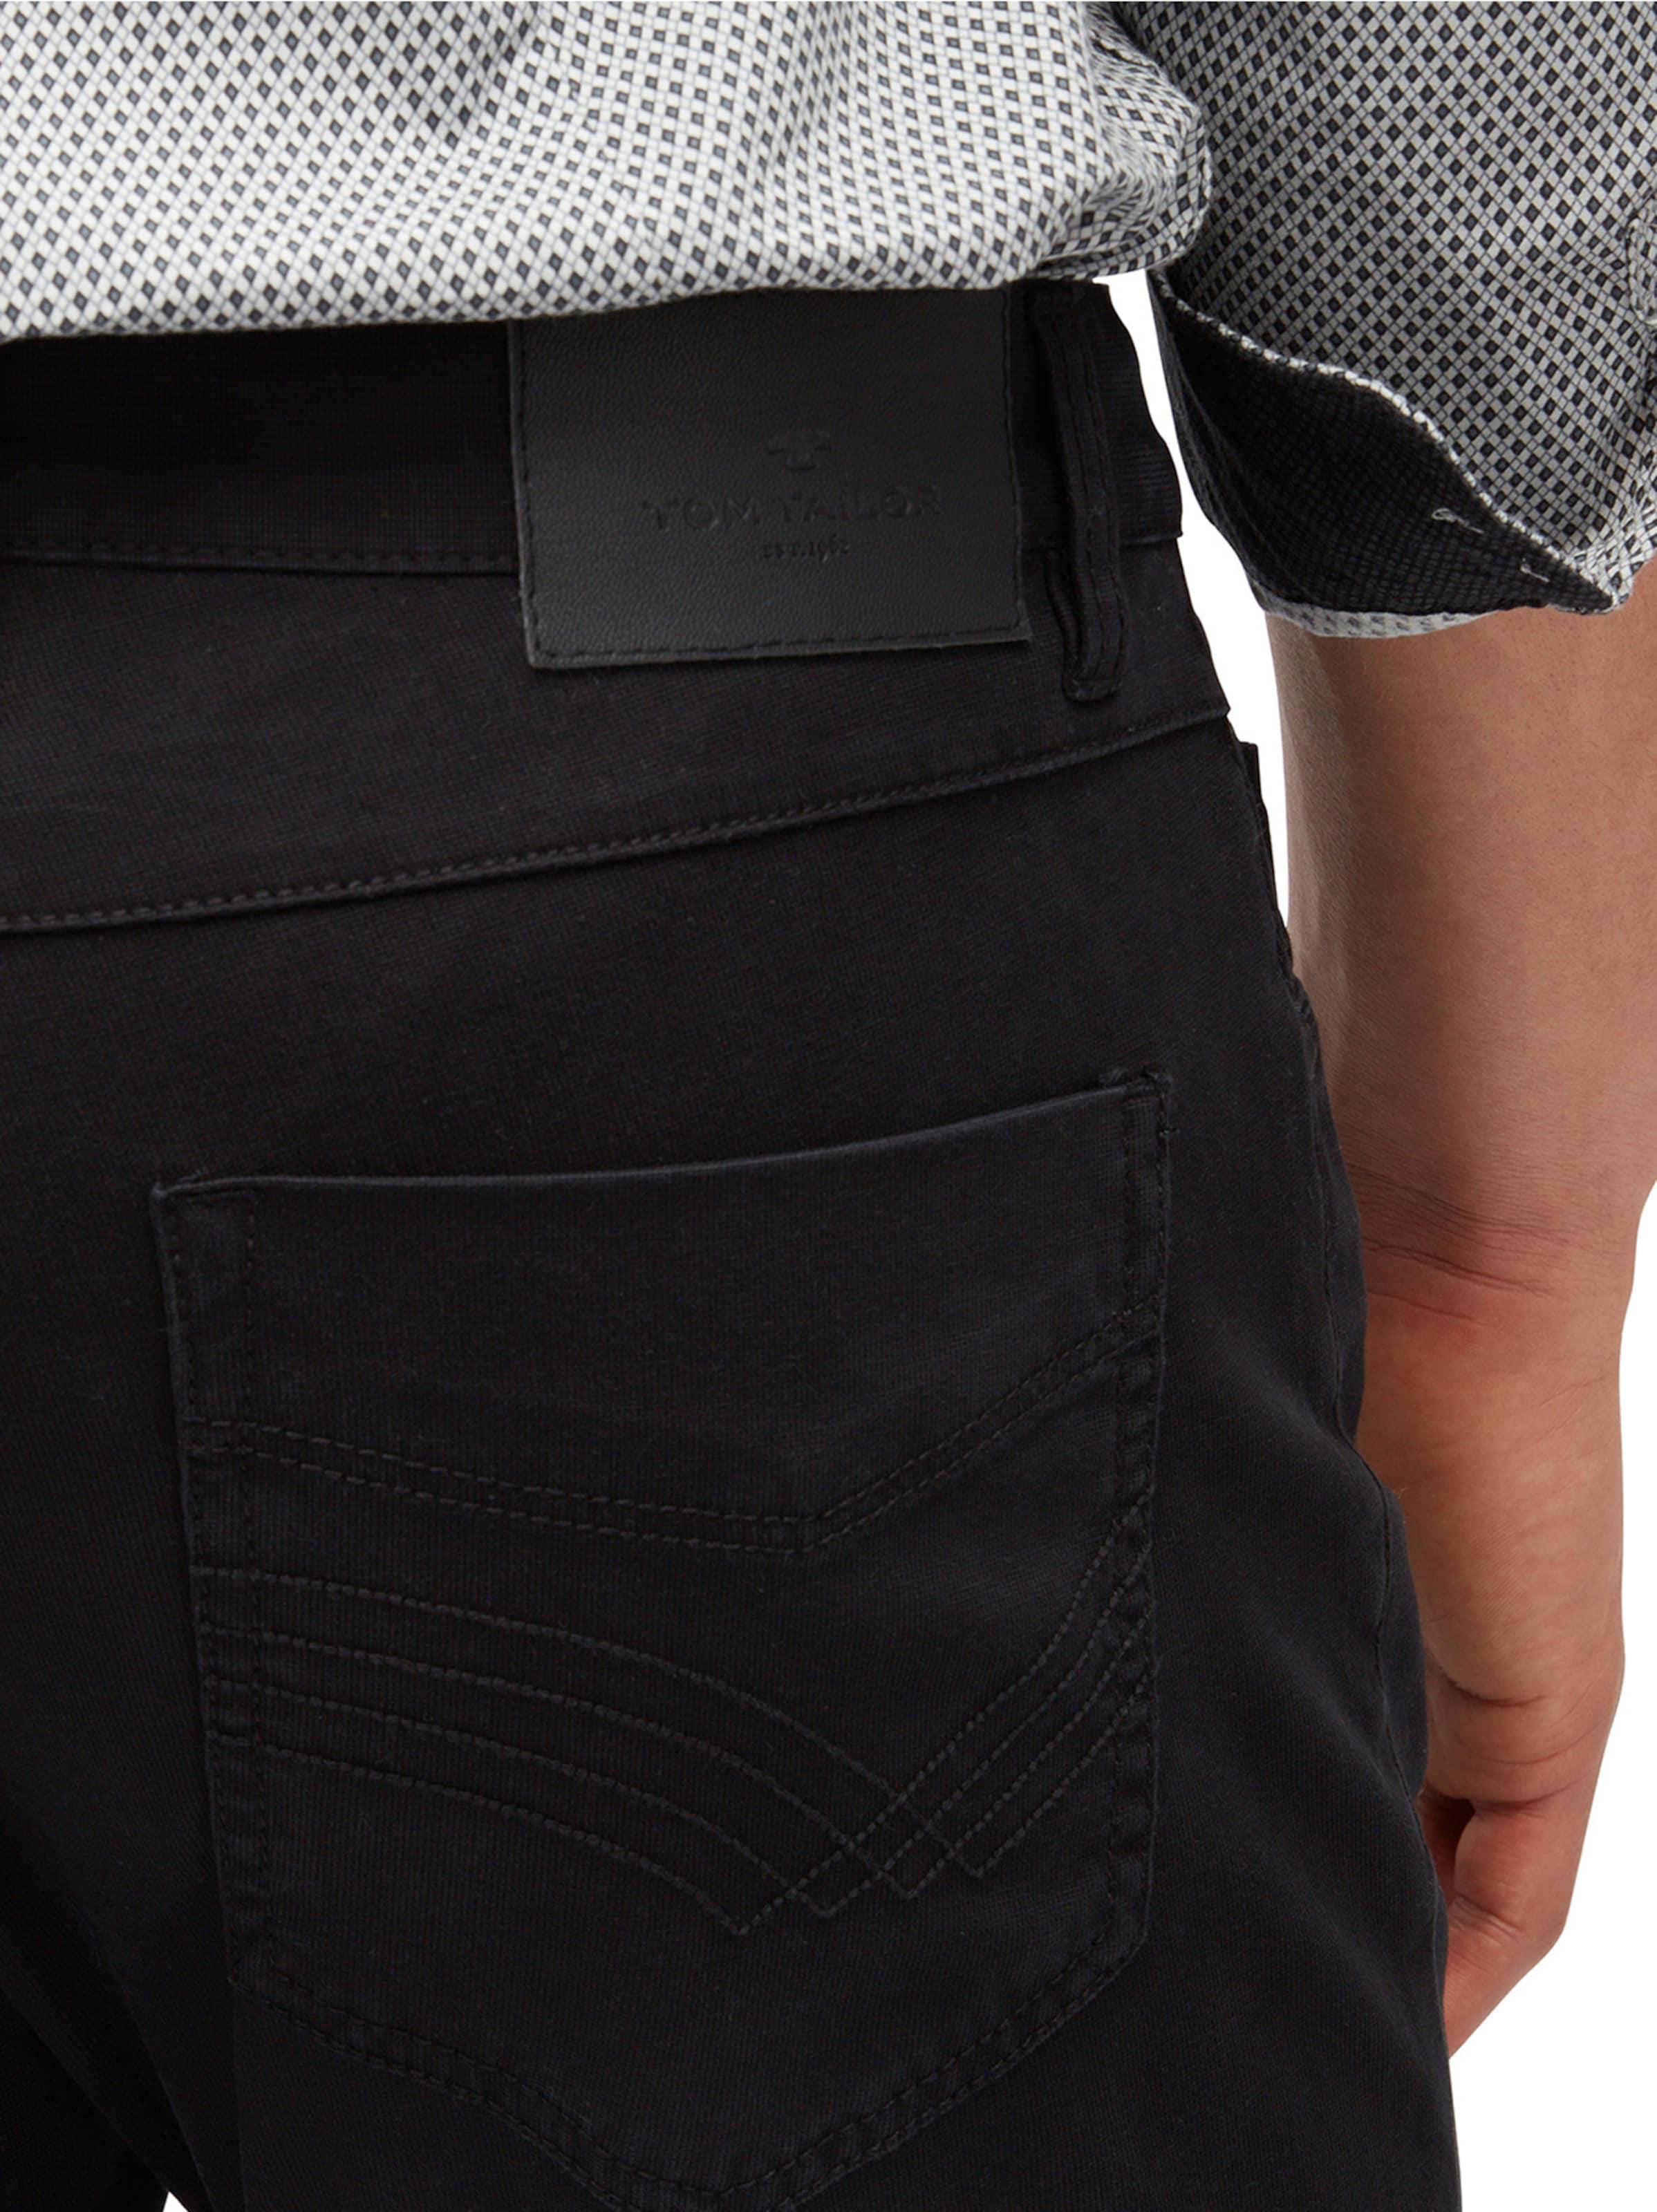 Authentisch Günstiger Preis TOM TAILOR pants / trousers Josh Regular Slim Hose Verkauf Rabatte enN2GstW6Q